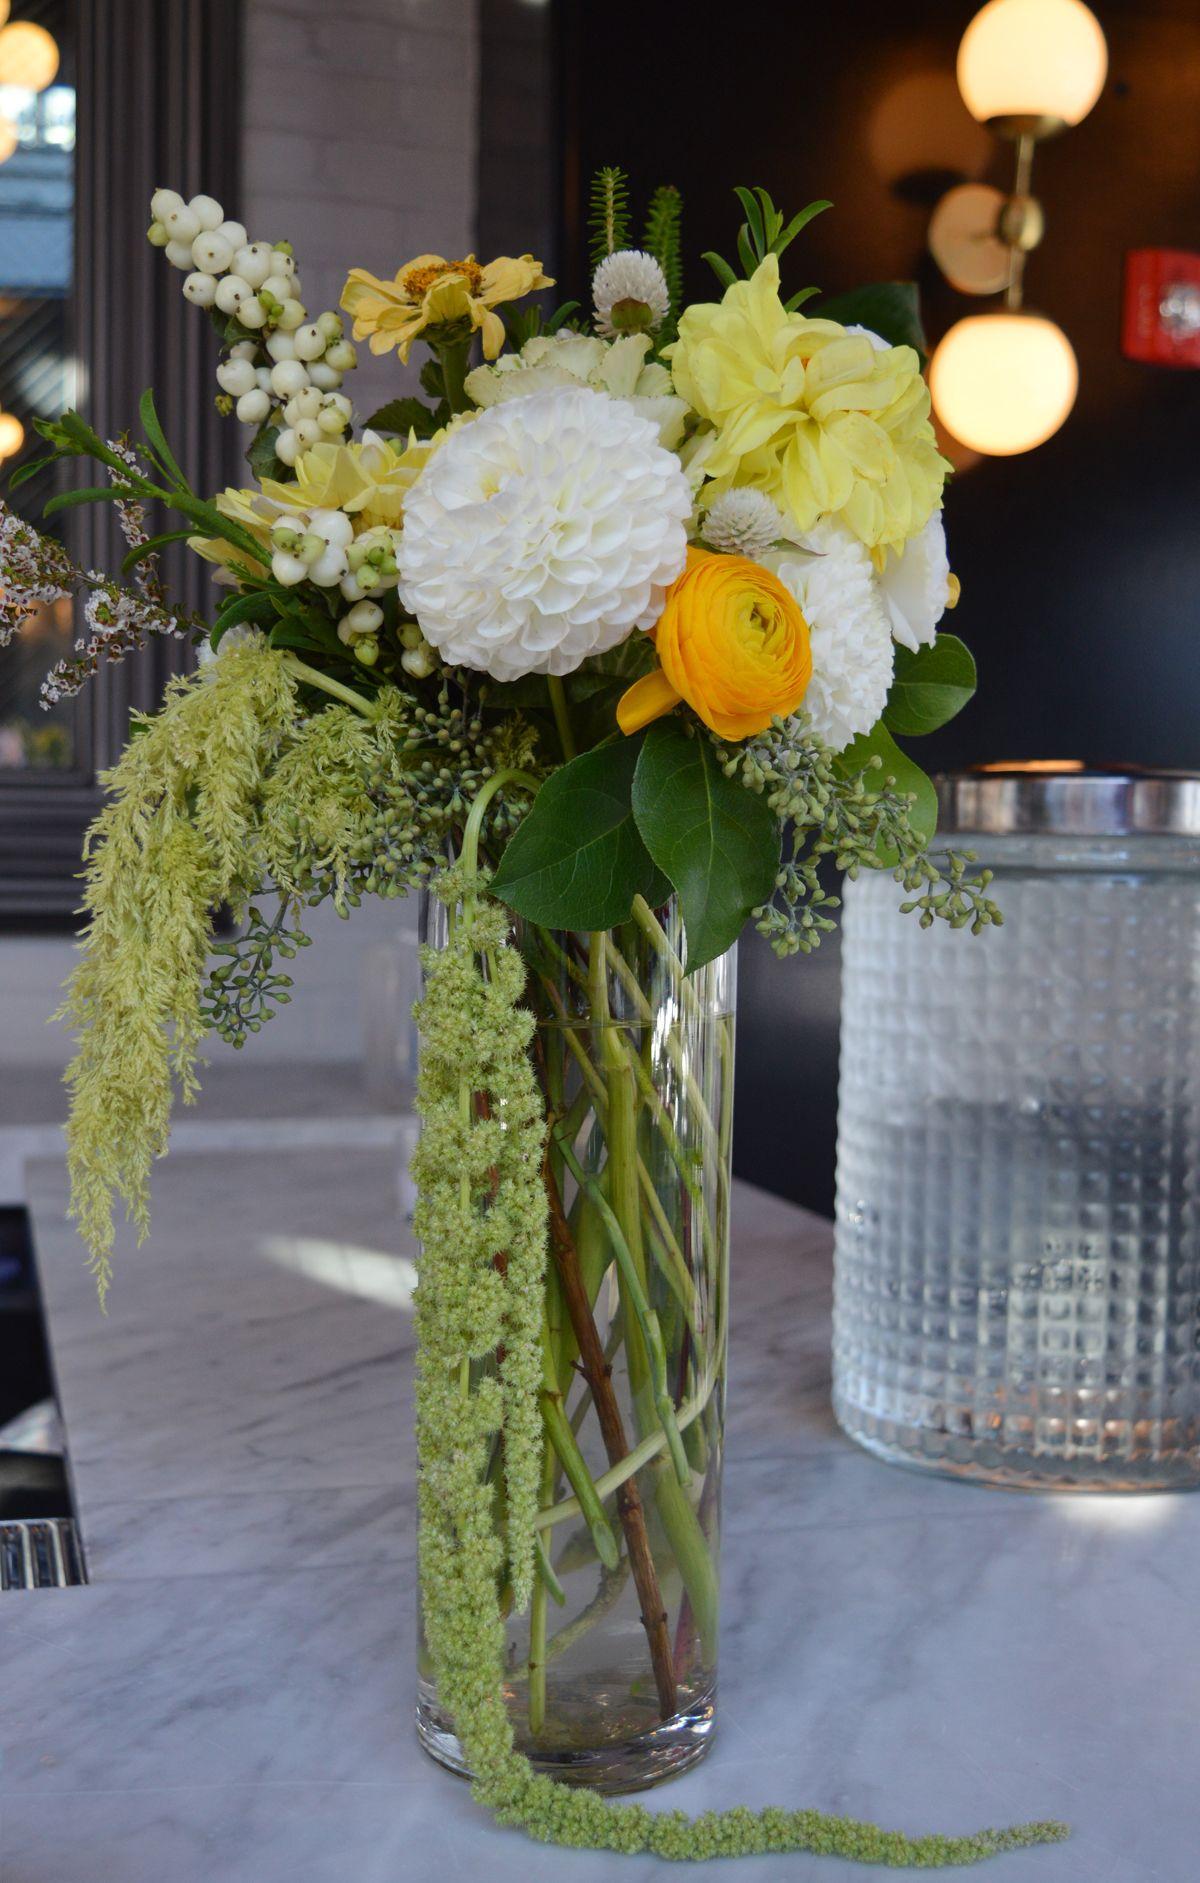 Bar arrangement with yellow and white dahlia amarartus